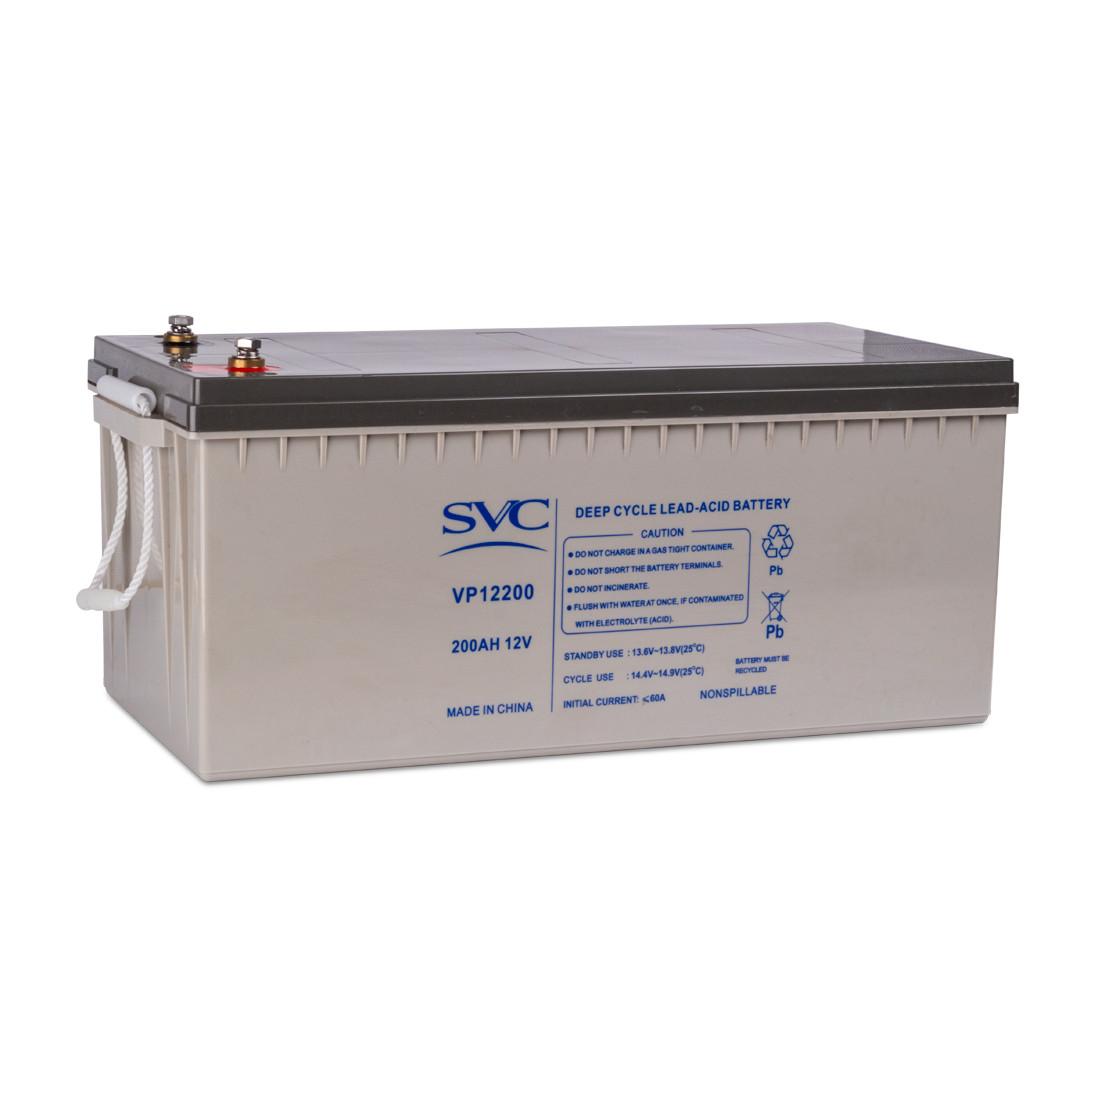 Батарея свинцово-кислотная SVC VP12200 (12В, 200 Ач)